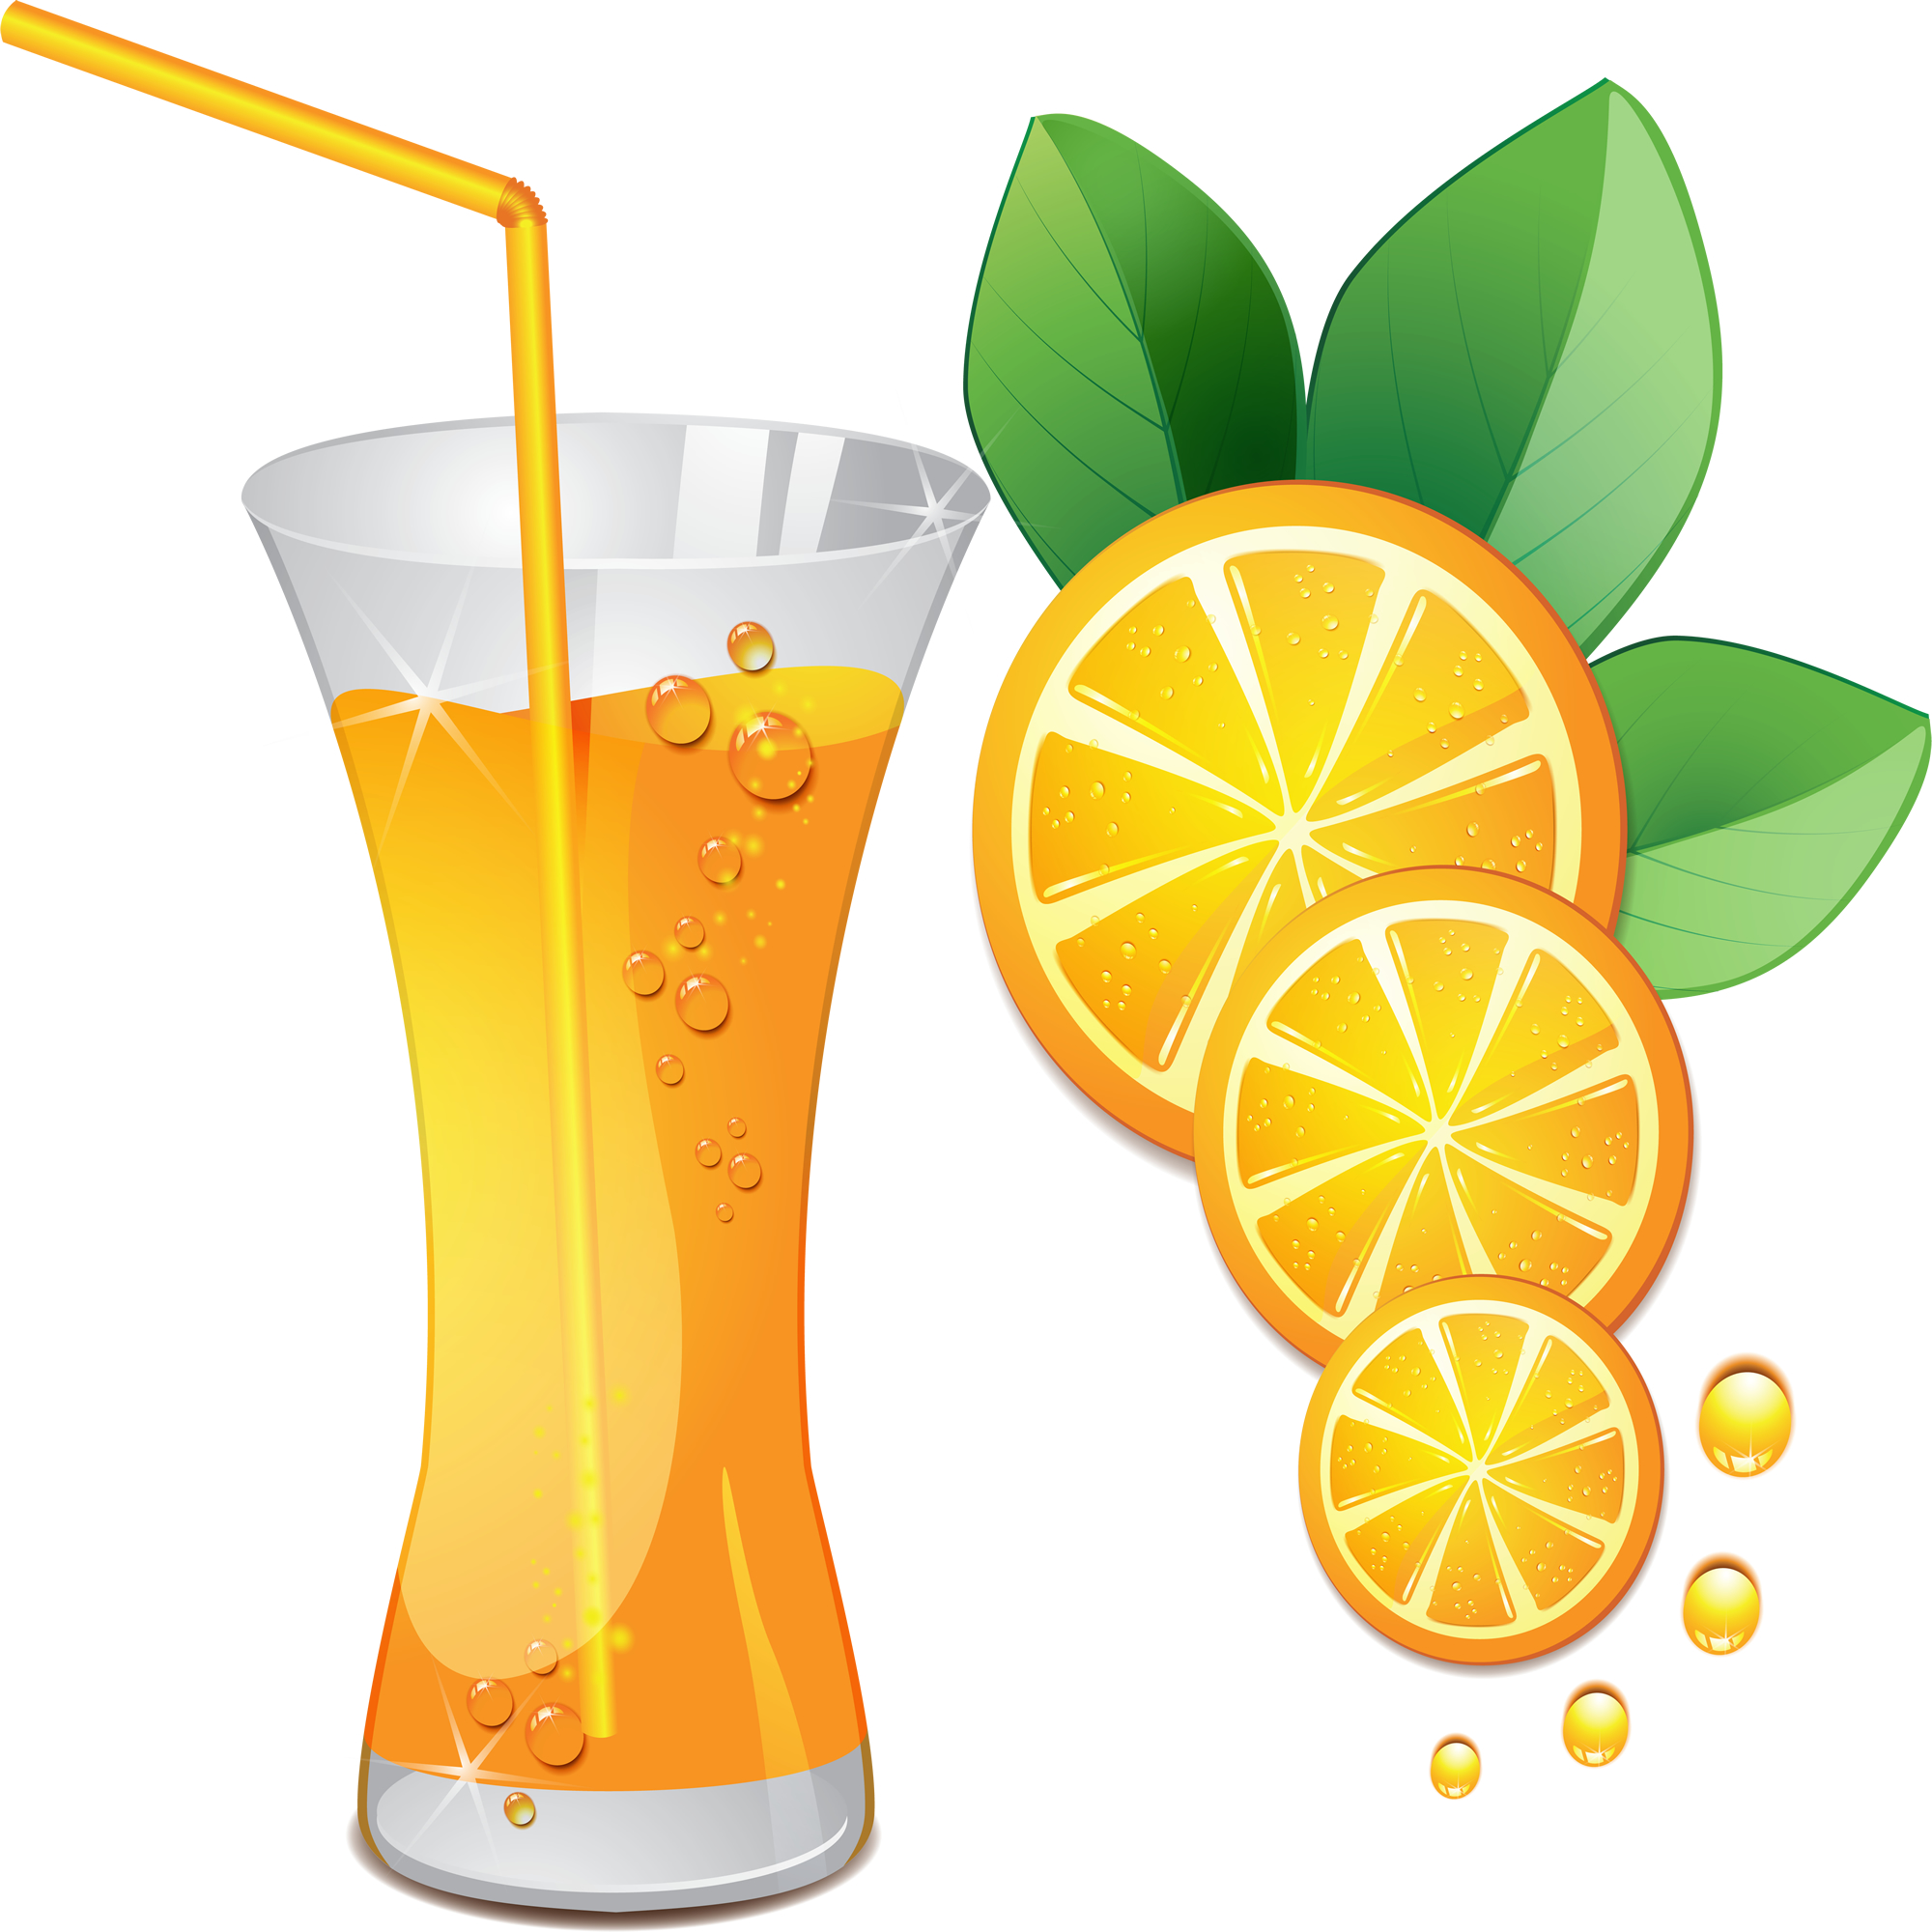 Juice clipart oren. Free cliparts download clip